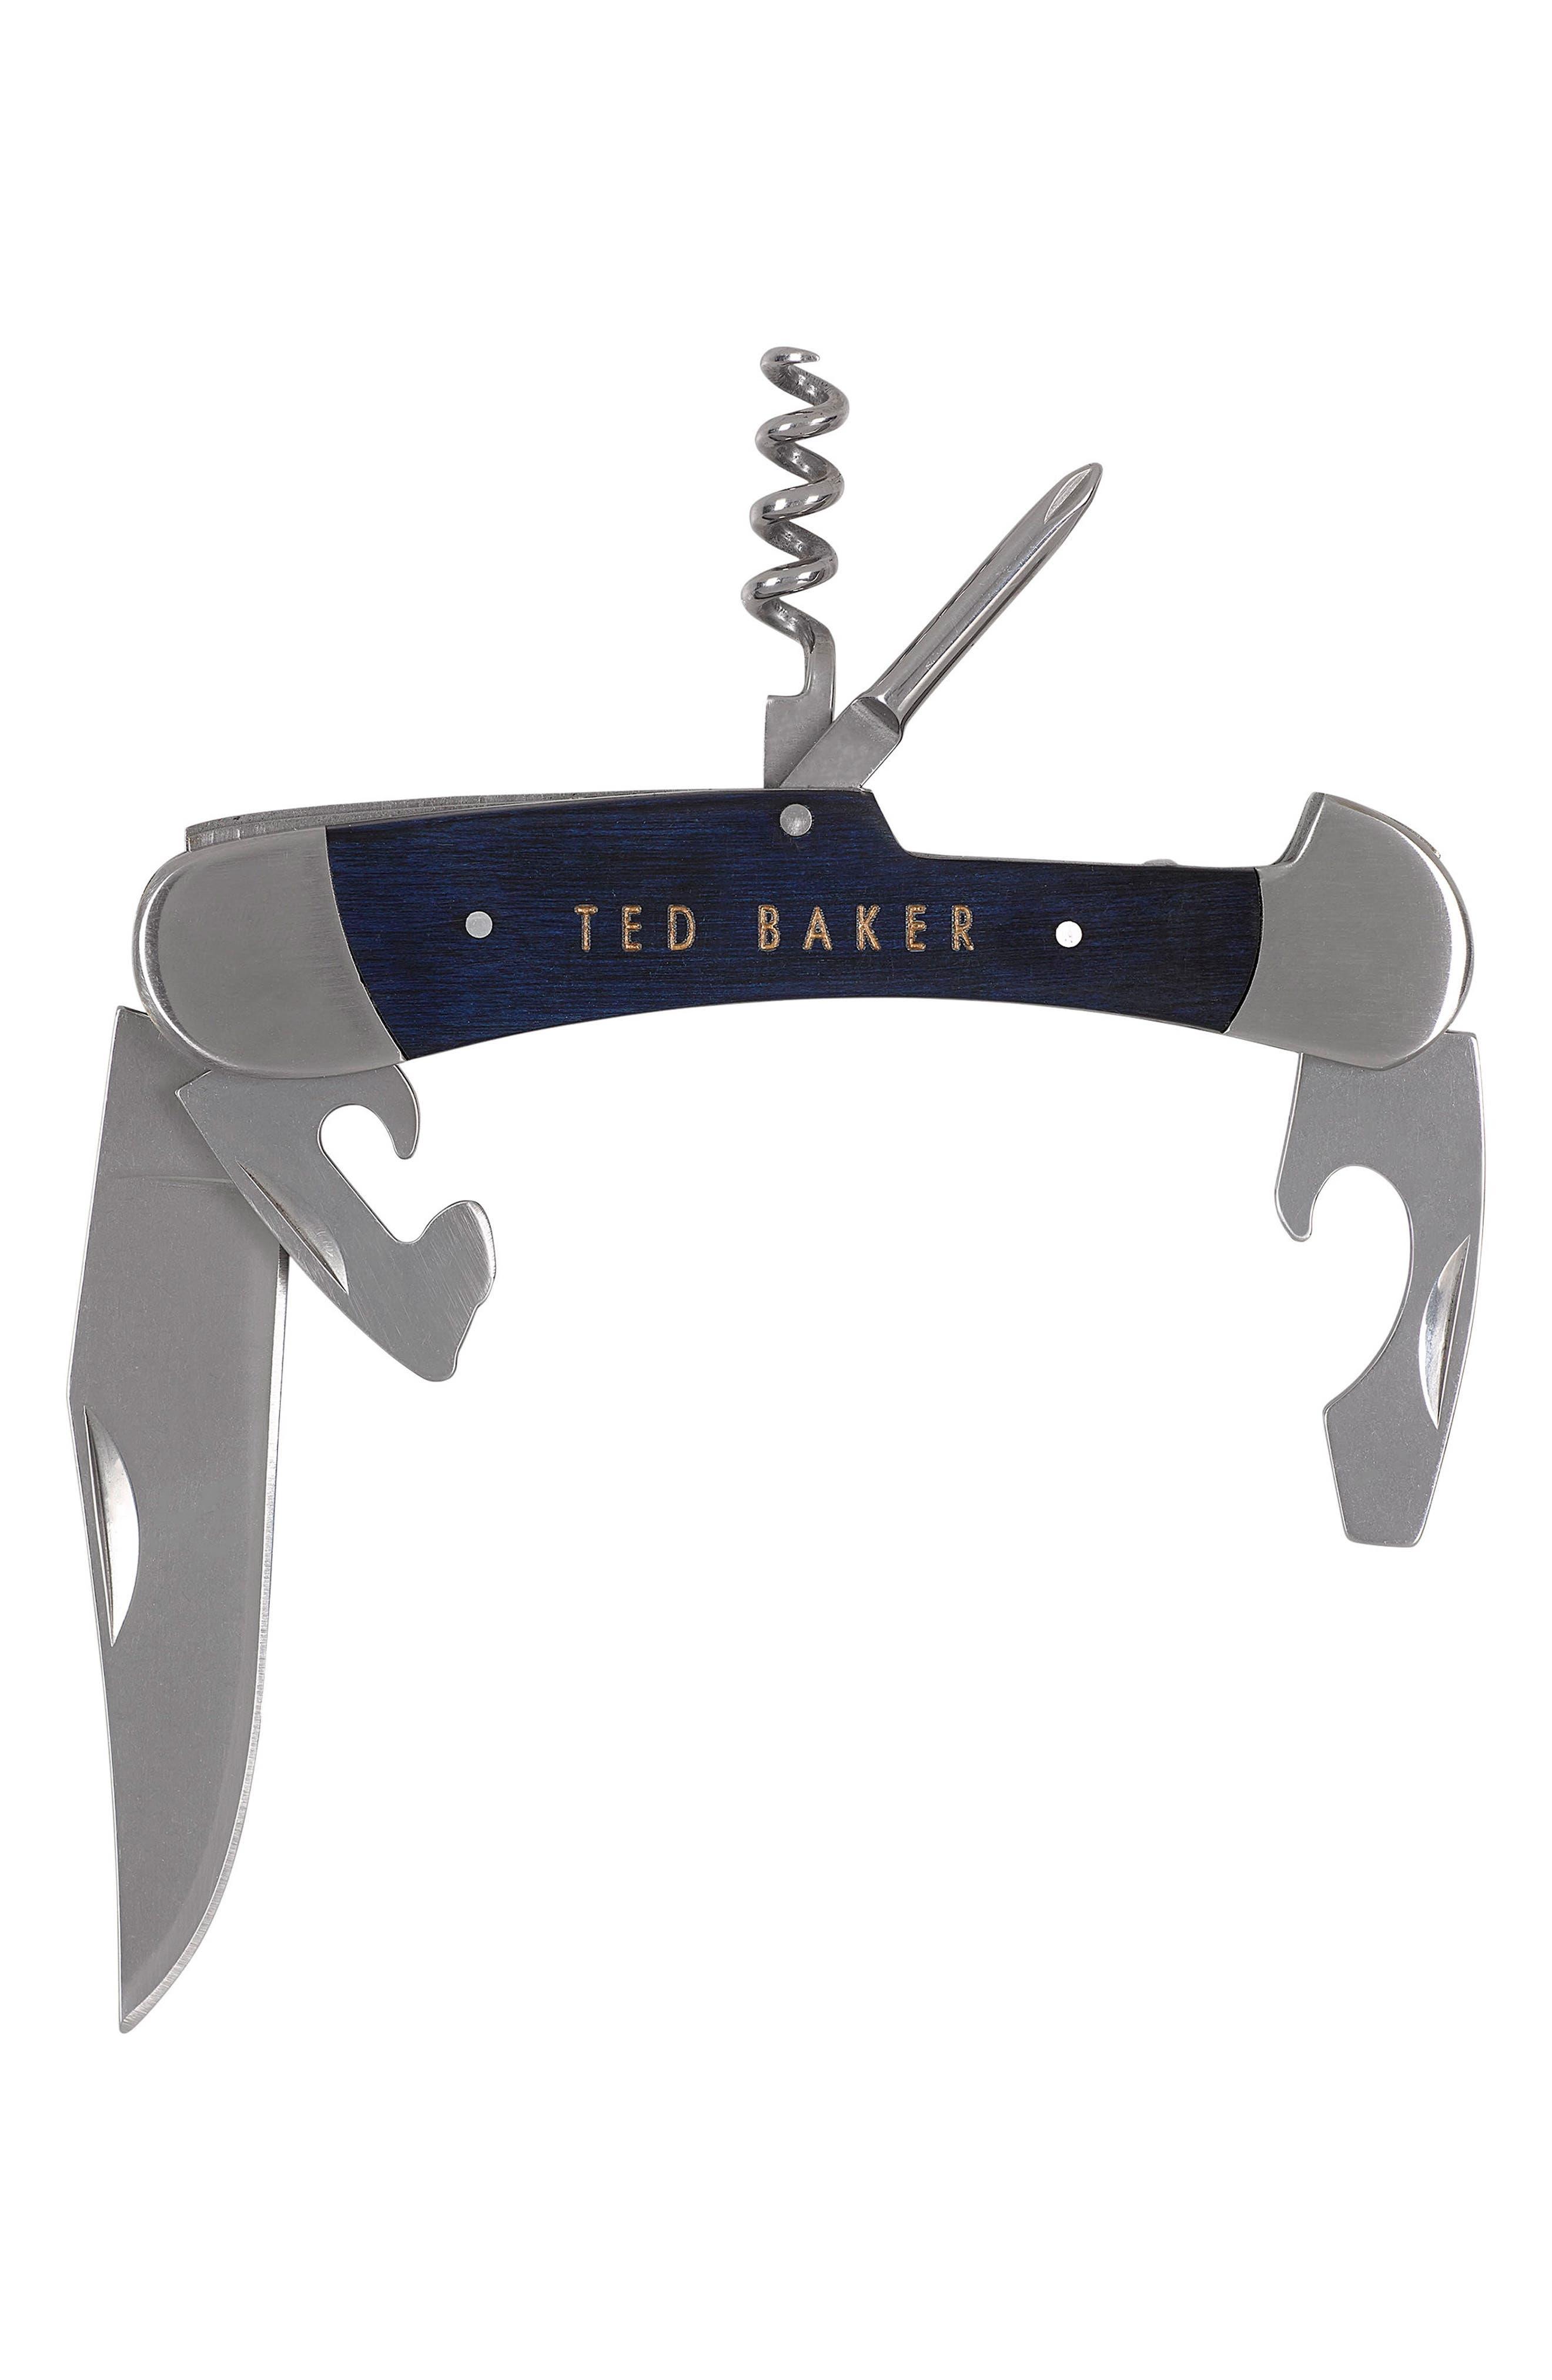 Multi-Tool Pen Knife,                             Alternate thumbnail 3, color,                             Blue Cadet